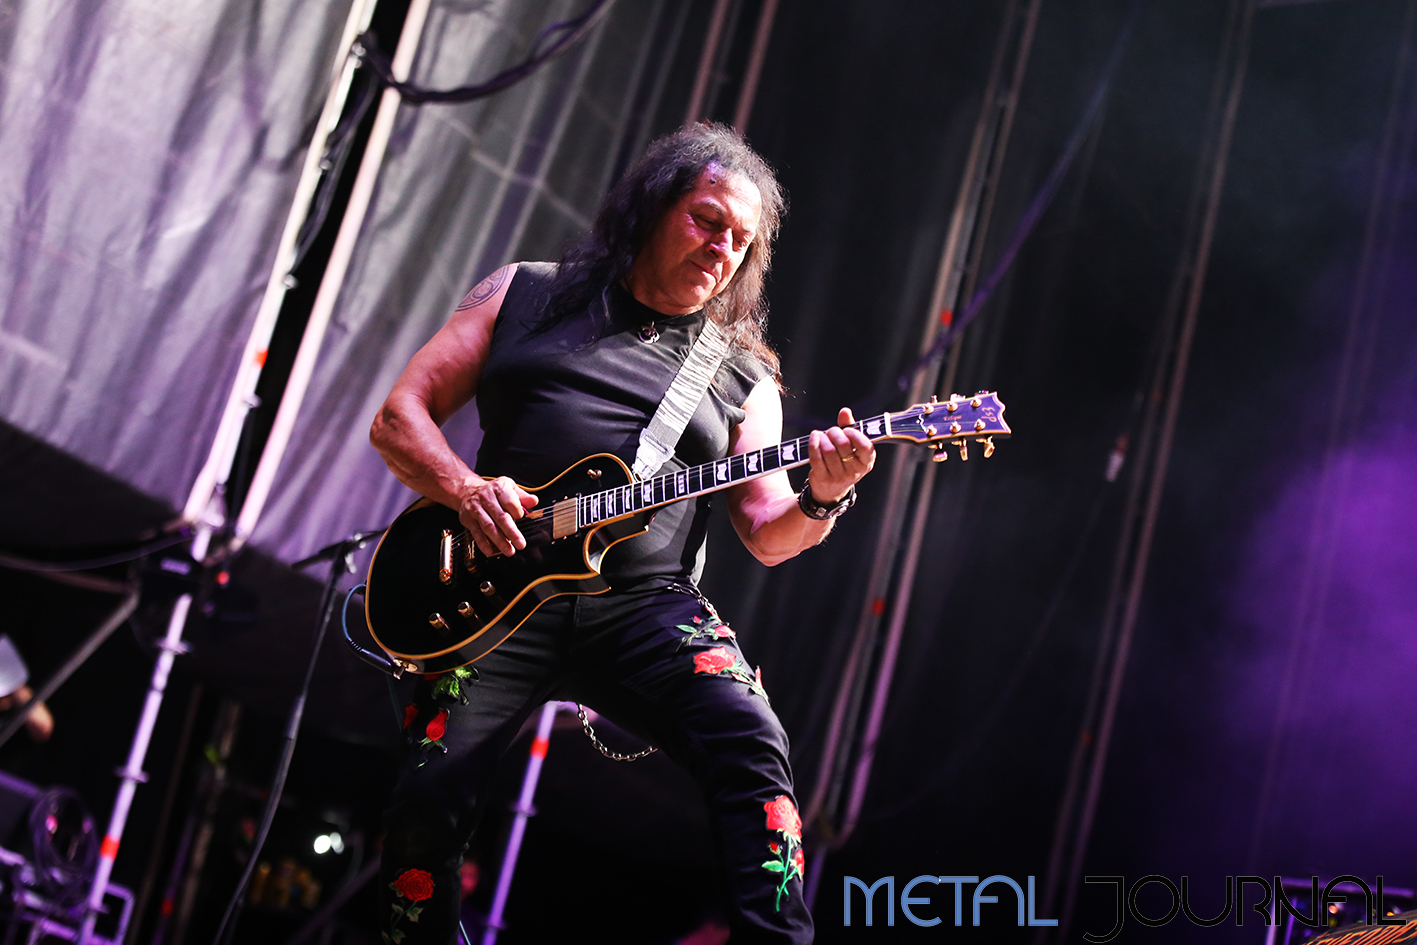 medina azahara - leyendas del rock 2019 metal journal pic 5